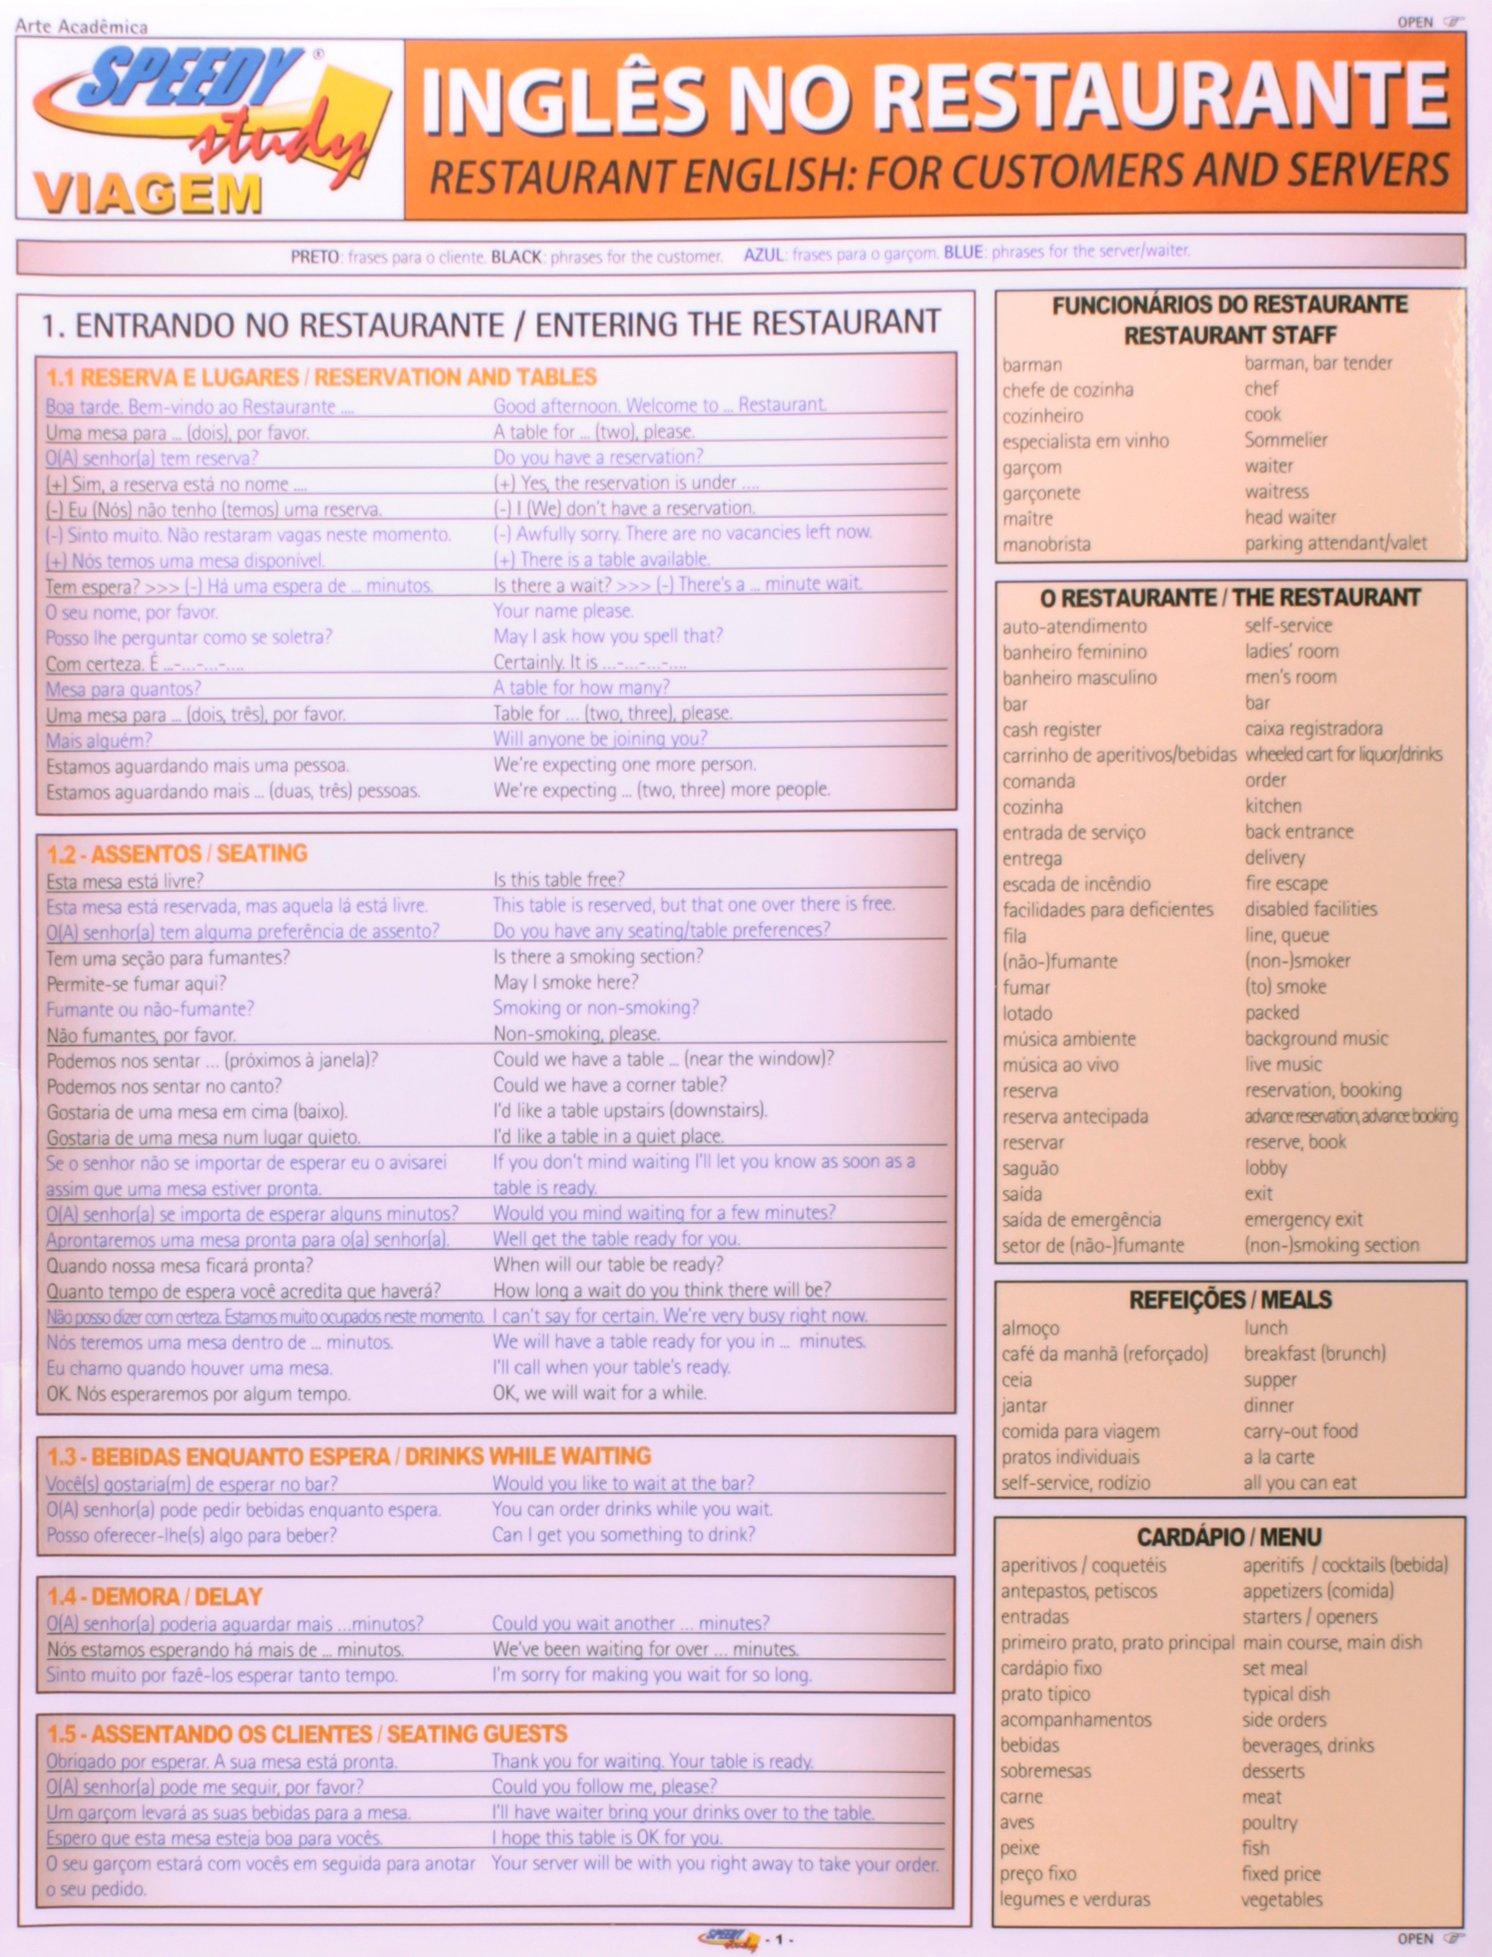 Ingles No Restaurante Restaurant English For Customers